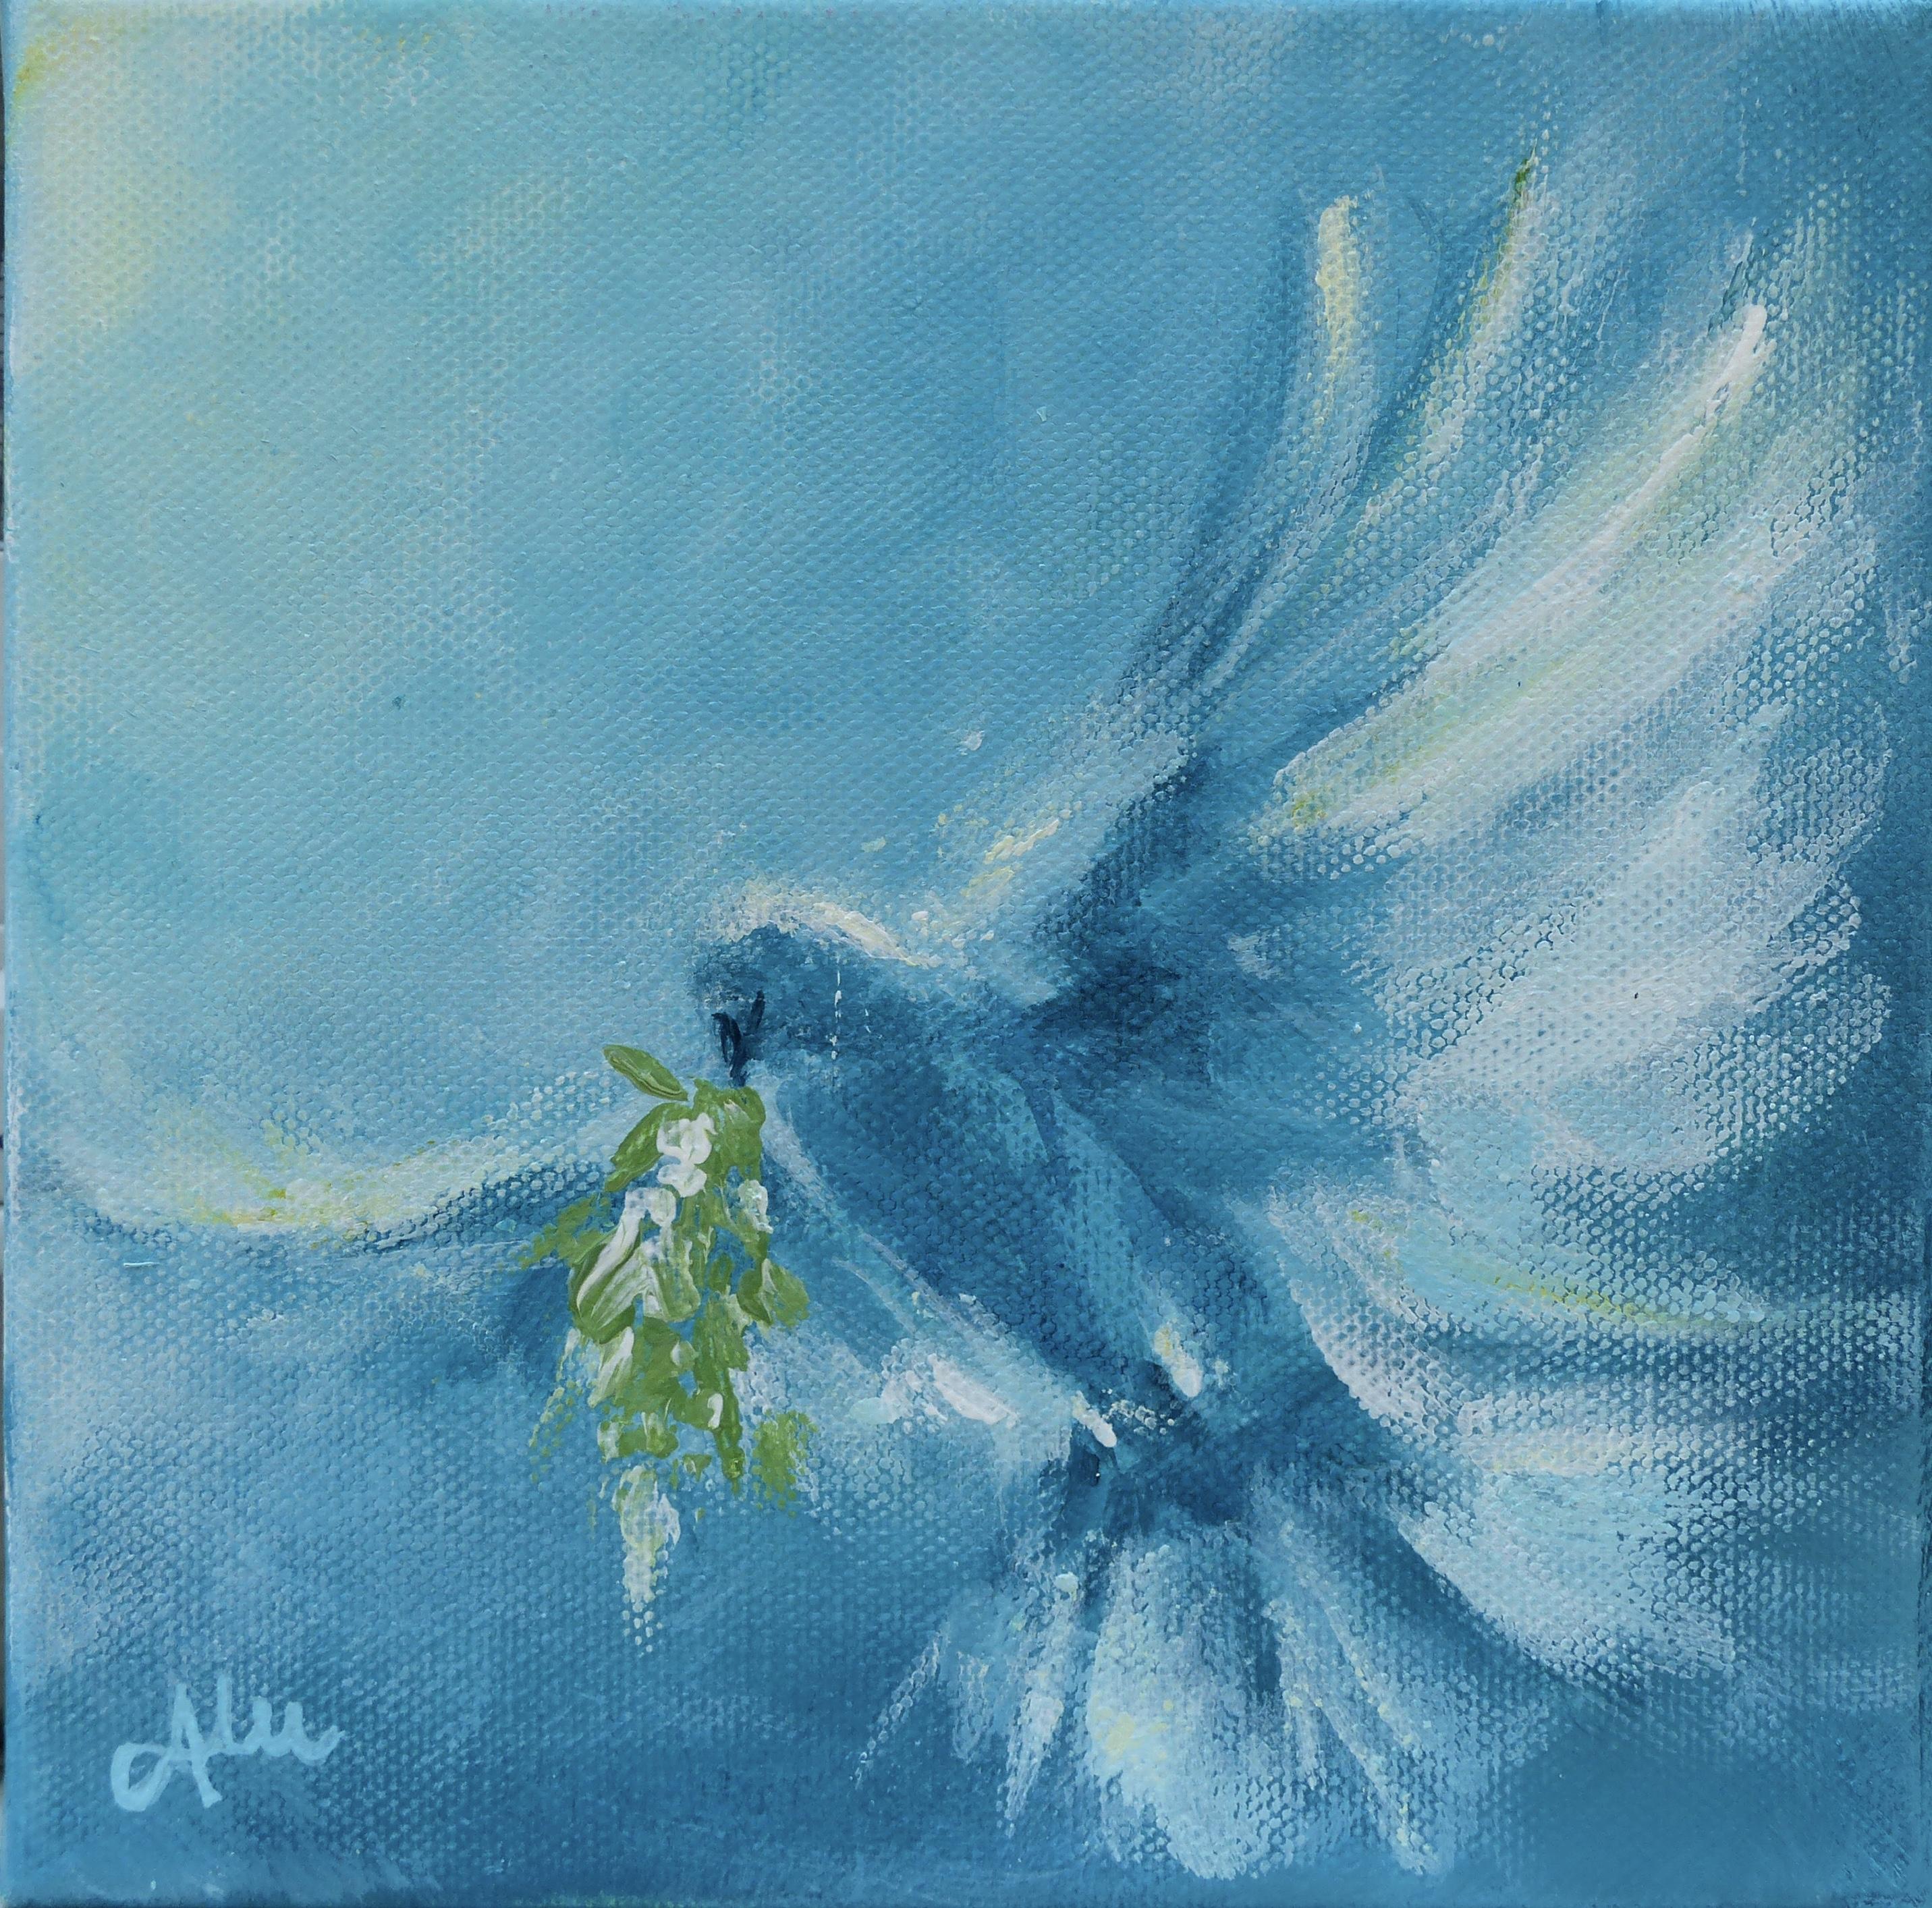 2019.08.18_Peace dove